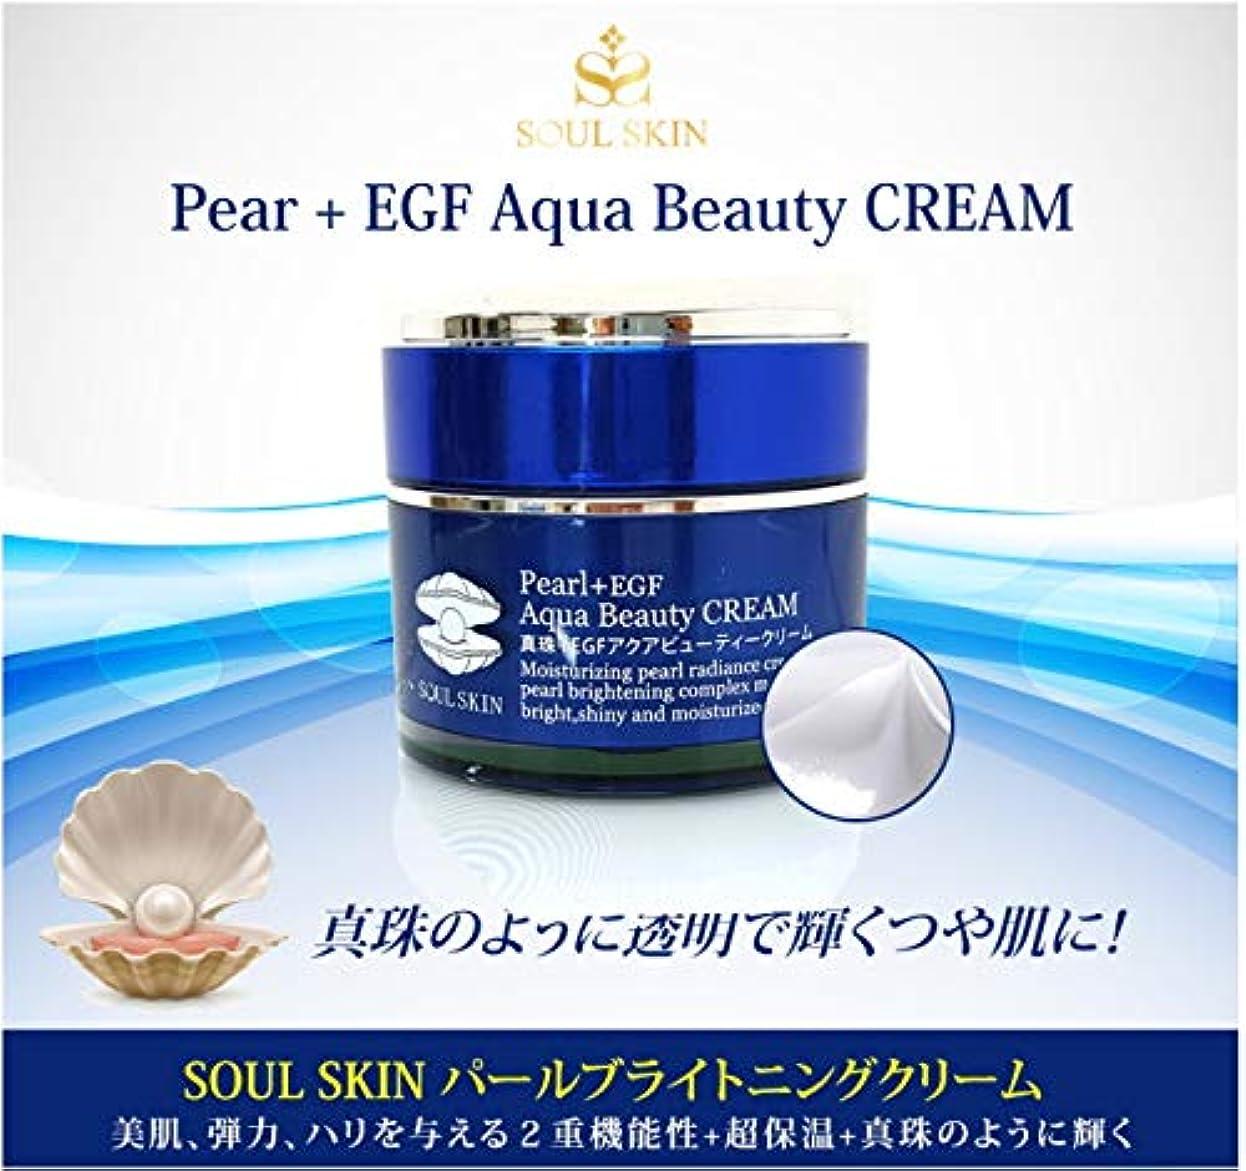 【SOUL SKINパールEGFクリーム】真珠クリーム/赤みを抑える/モイスチャークリーム アクア 保湿成分配合